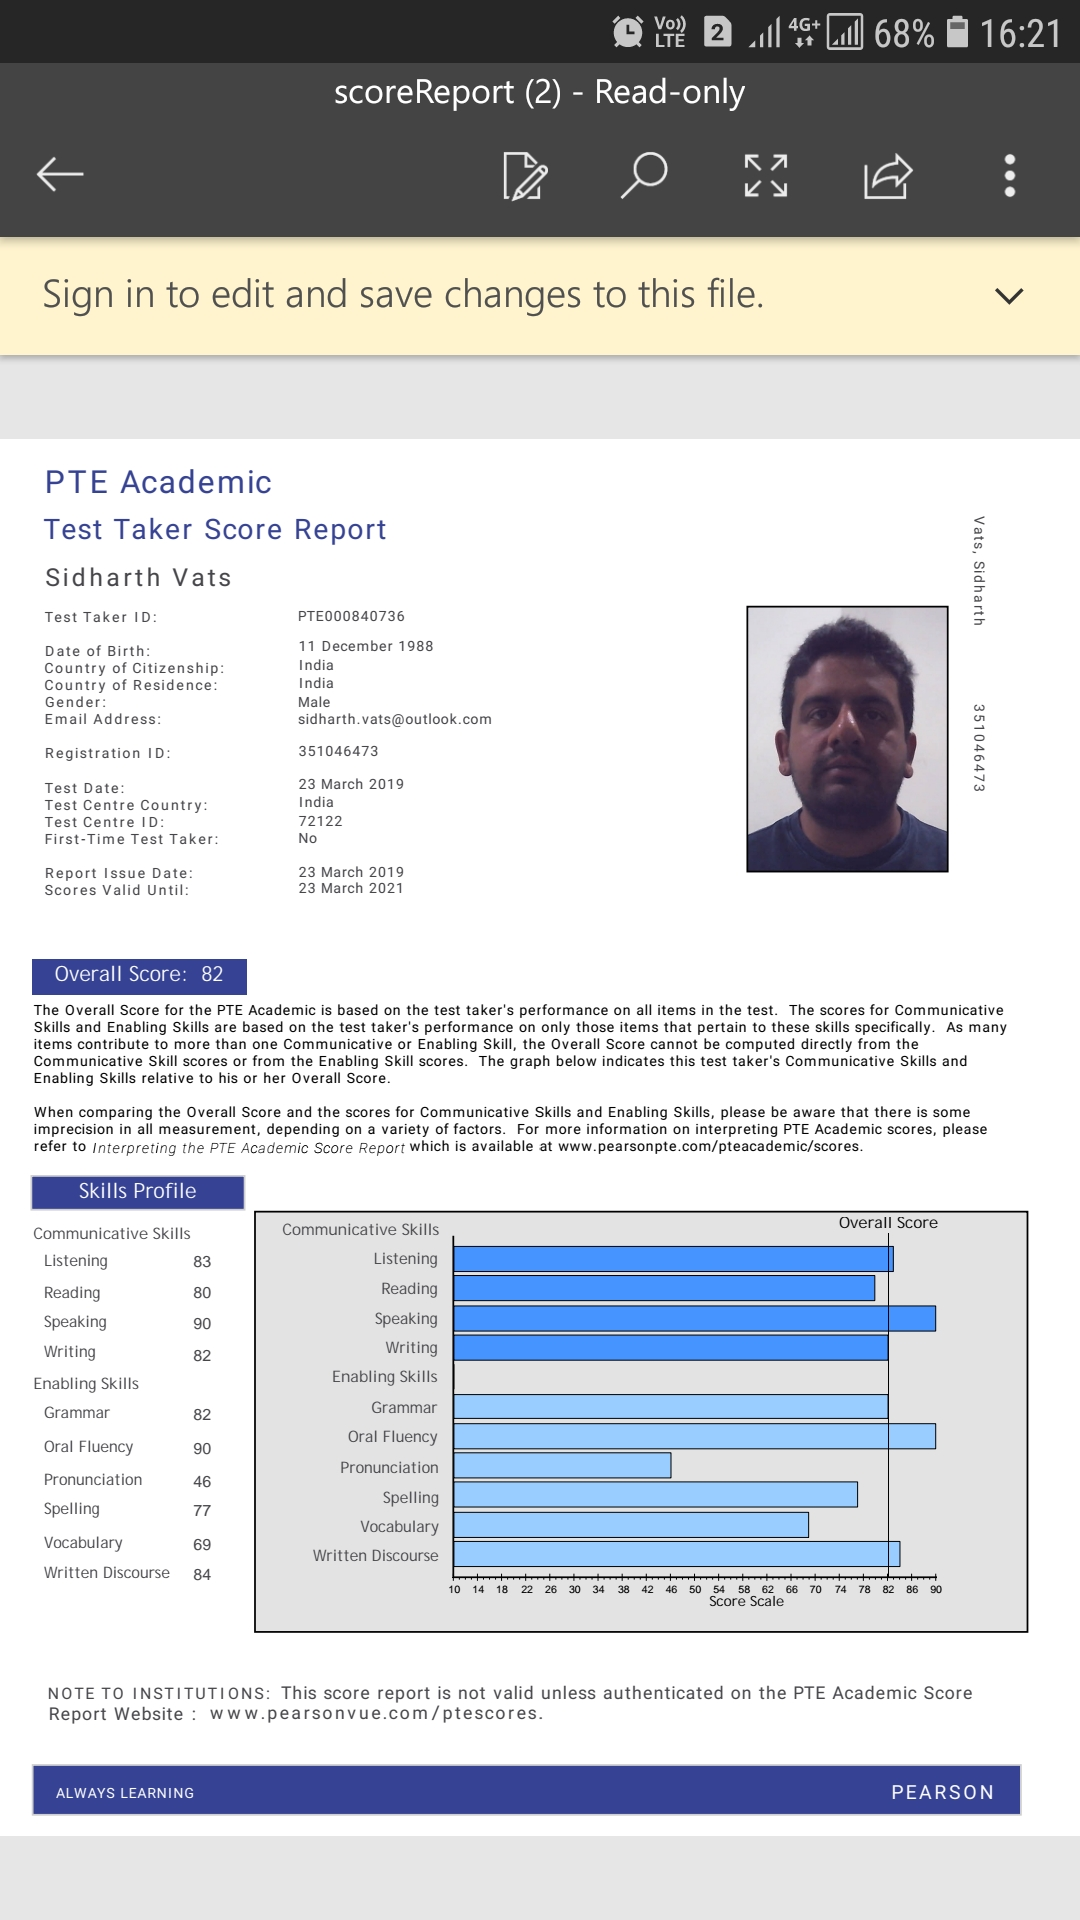 JSSM Best IELTS,PTE Spoken English institute, #best PTE coaching institute in kharar#top PTE tutorial in kharar#successful PTE coaching hub in kharar#best IELTS INSTITUTE in kharar#top IELTS coaching hub in kharar